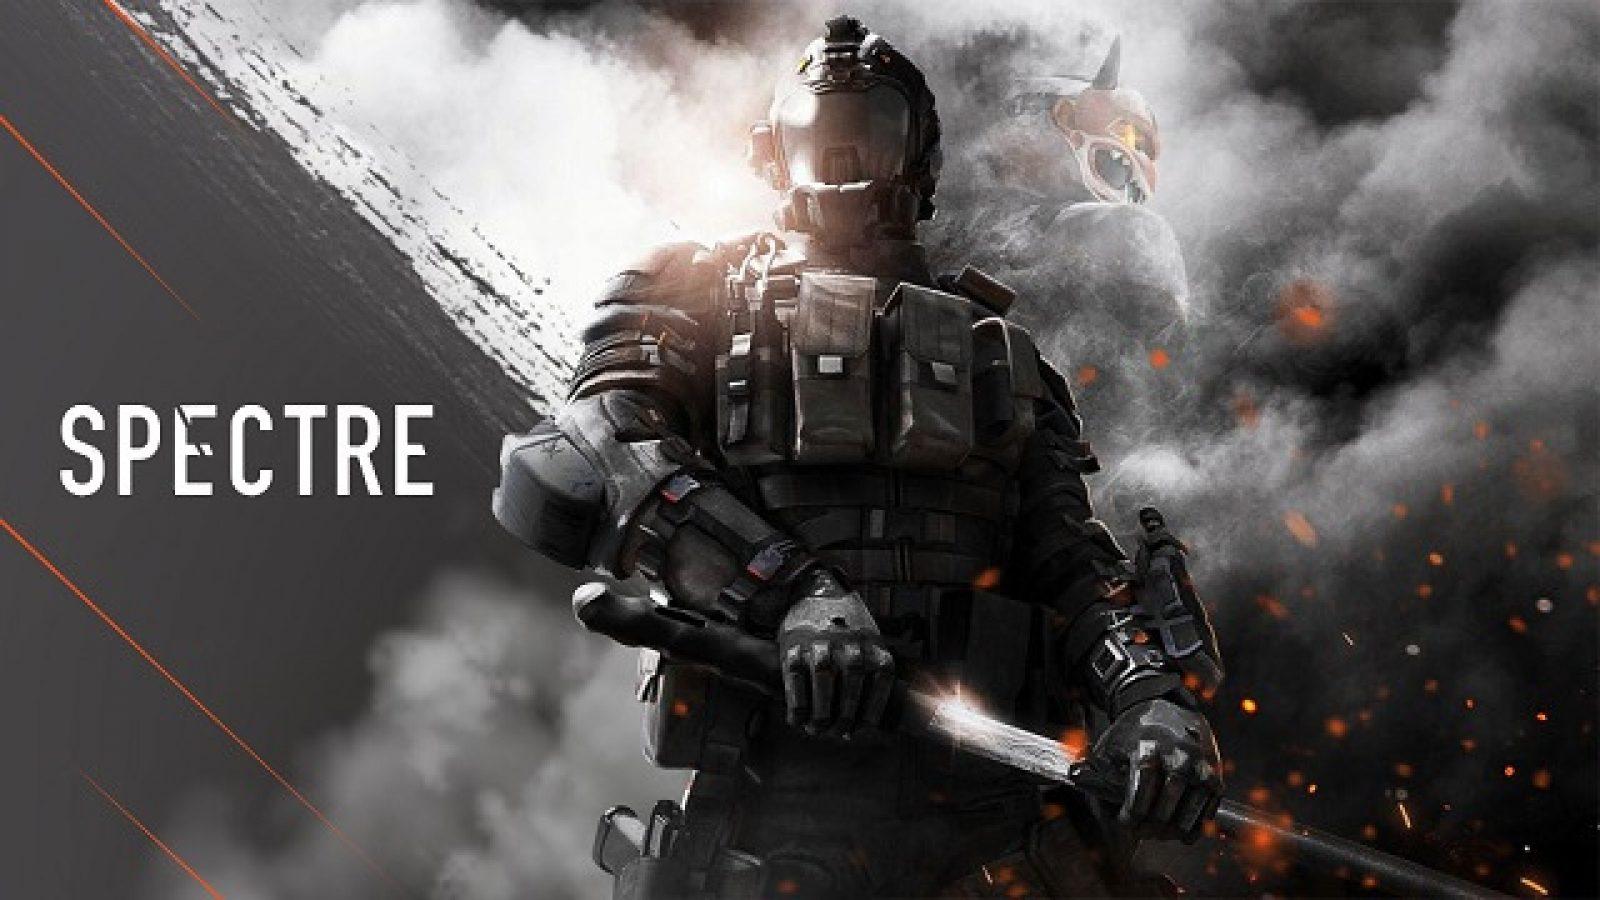 Spectre Black Ops 4 1600x900 Wallpaper Teahub Io